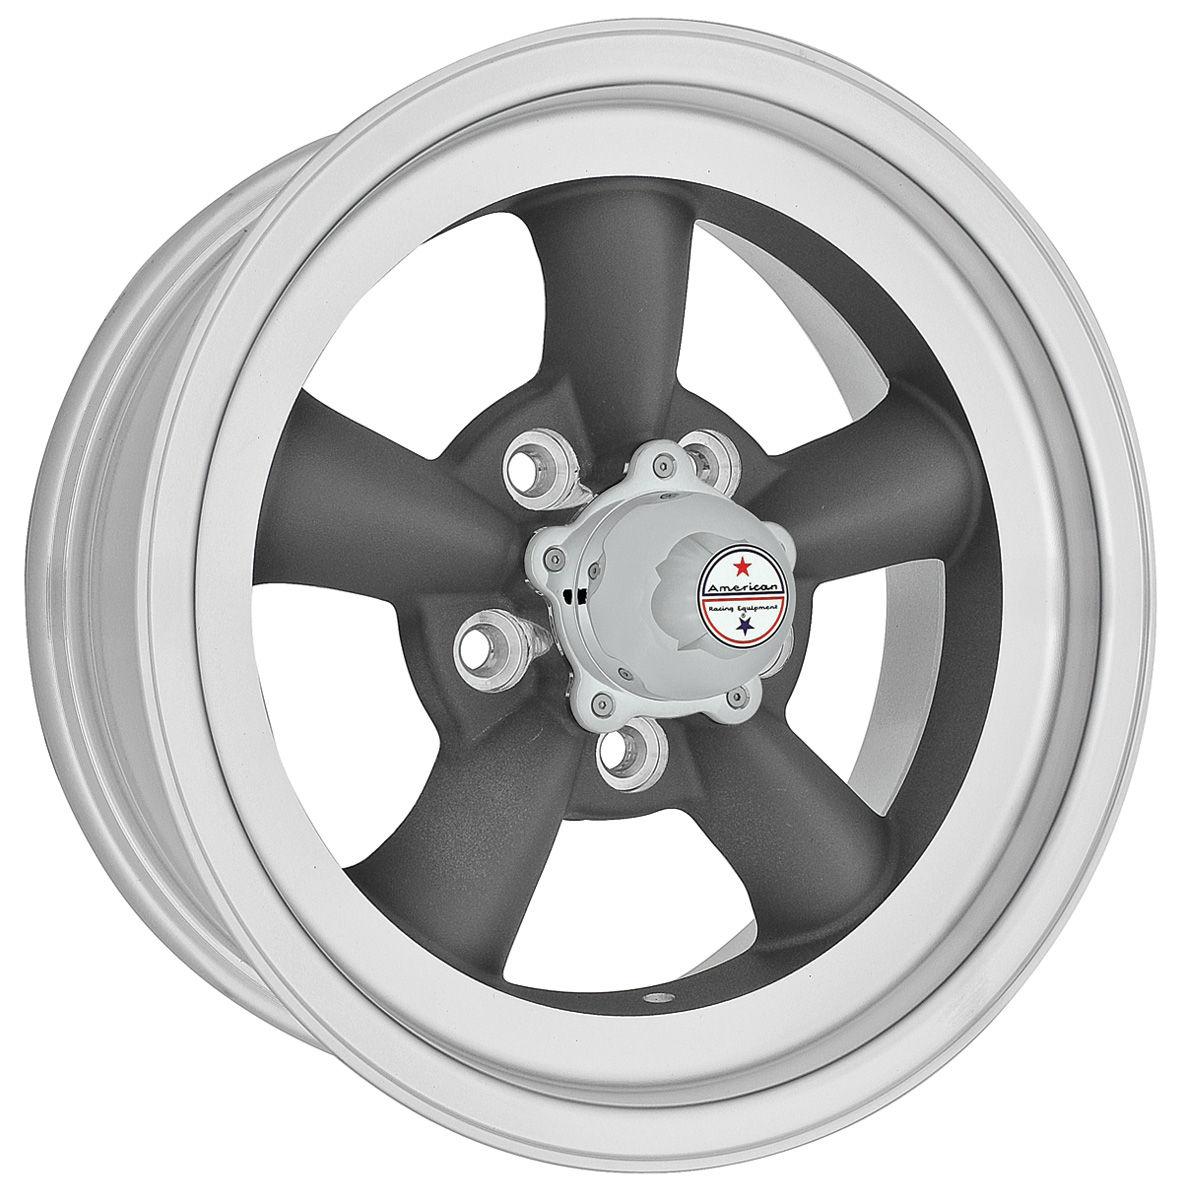 "Photo of Wheel, Torq-Thrust D Racing 15"" x 7"" (B.S. 3-3/4"") -6 mm offset"